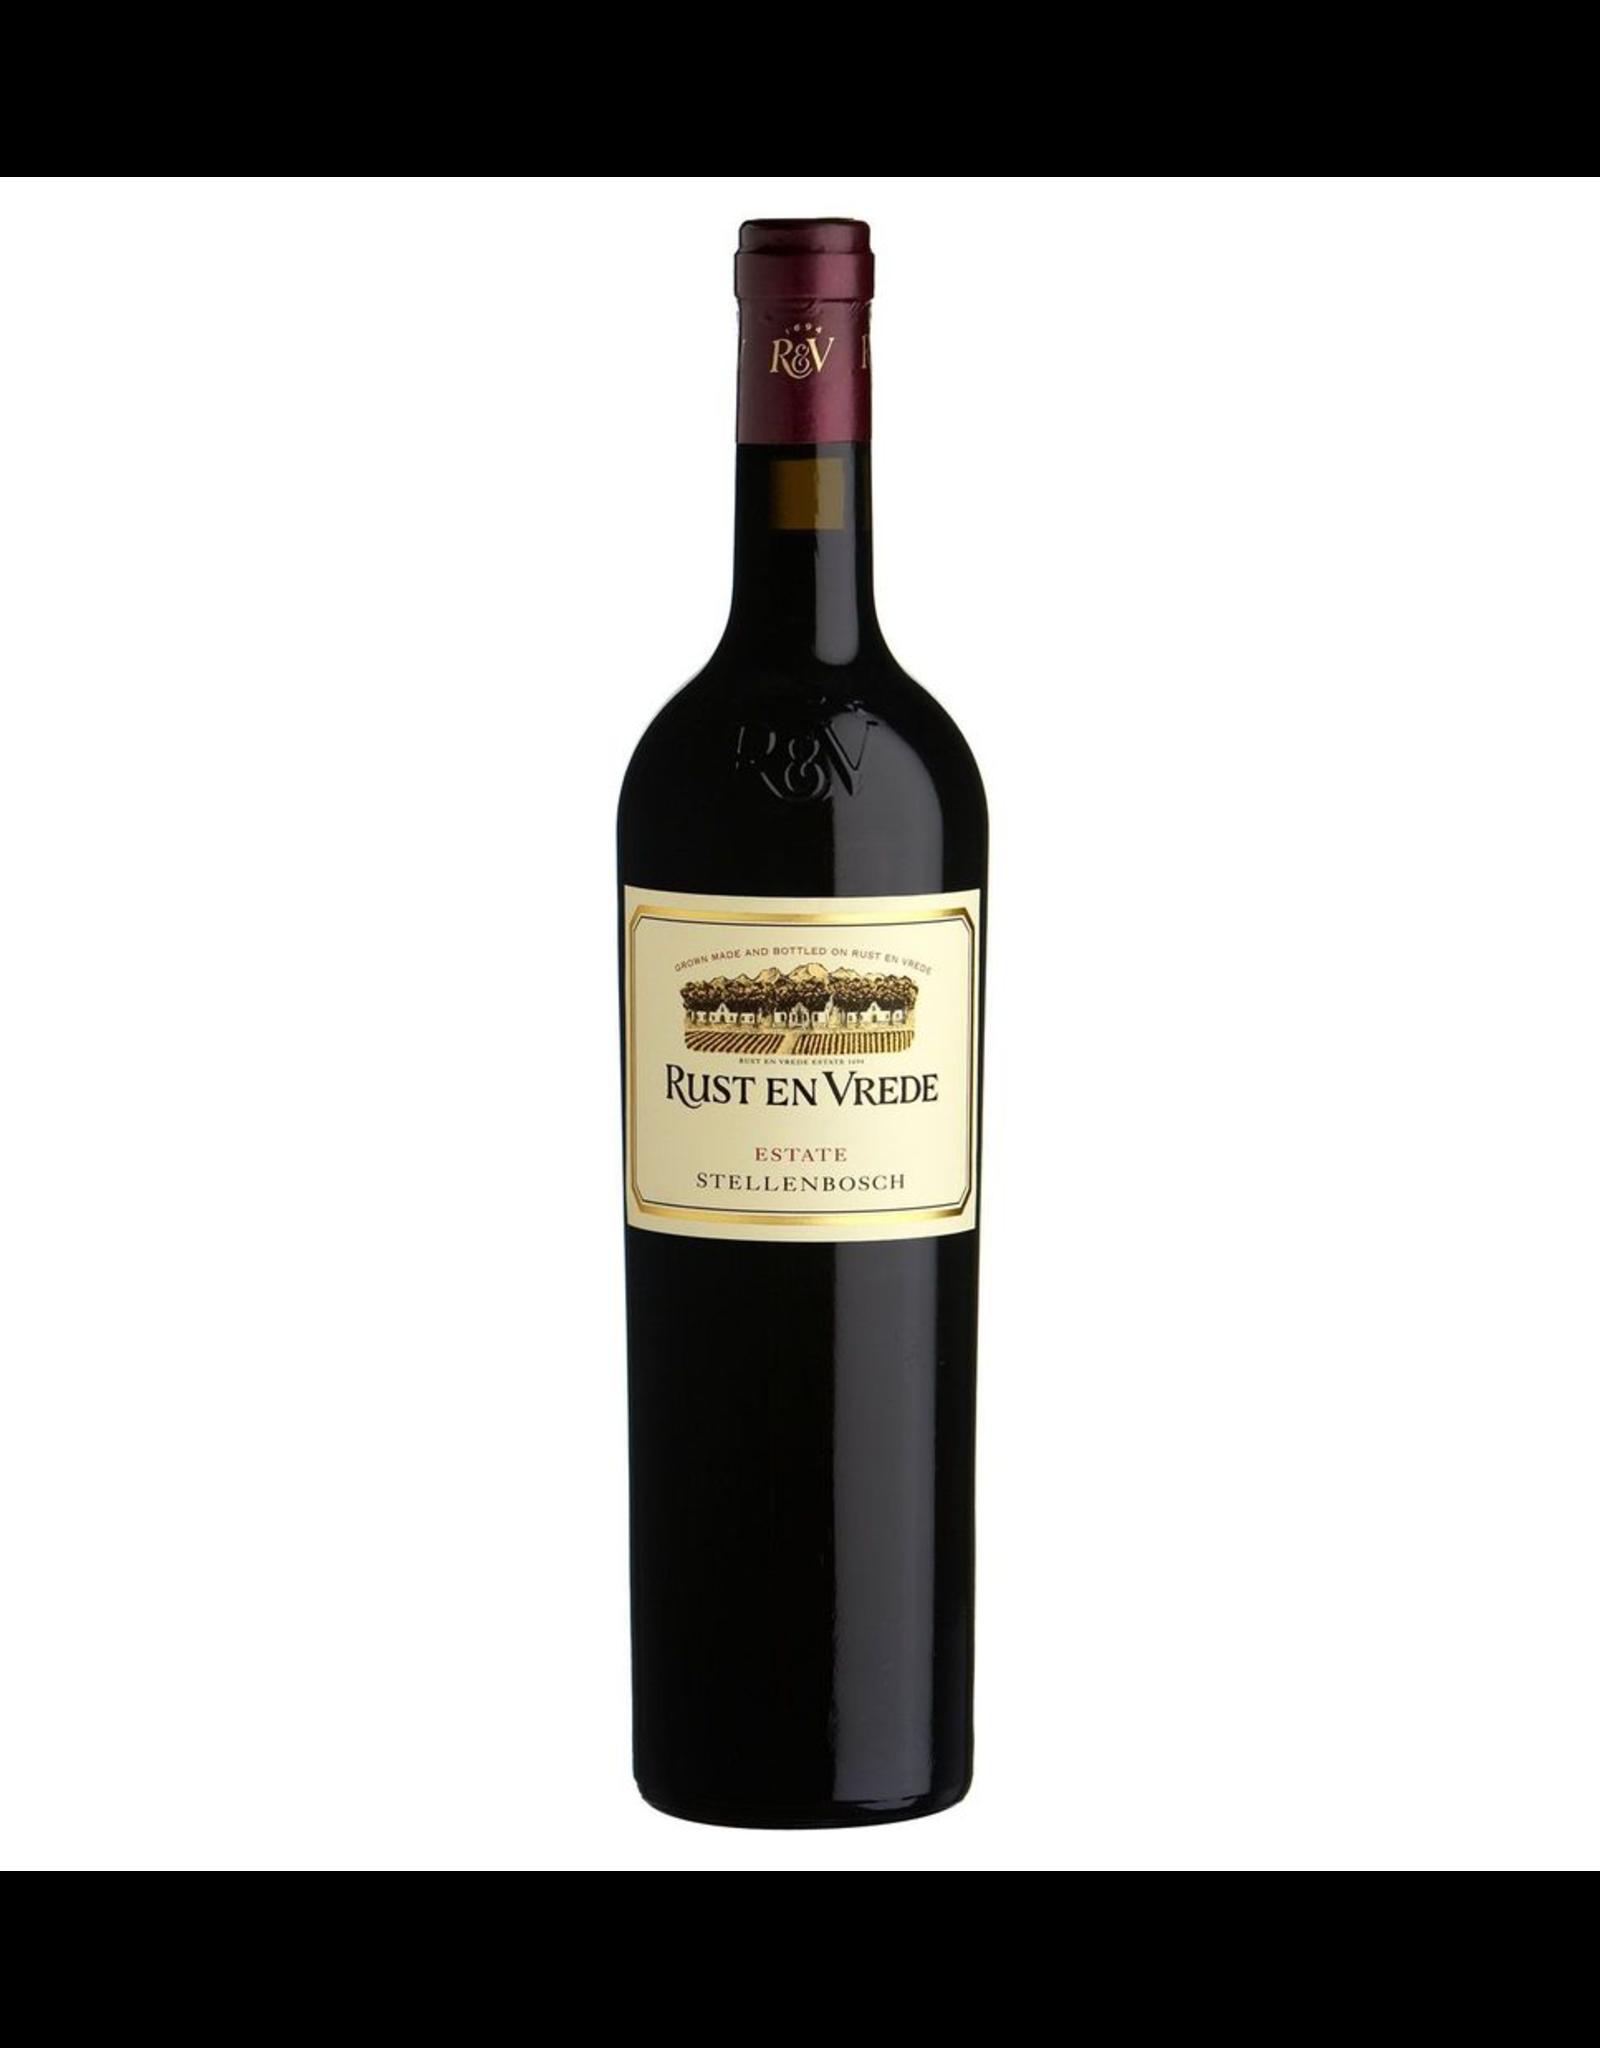 Red Wine 2012, Rust En Vrede, Merlot, Stellenboch, Coastal Region, South Africa, 14.5% Alc, CT85